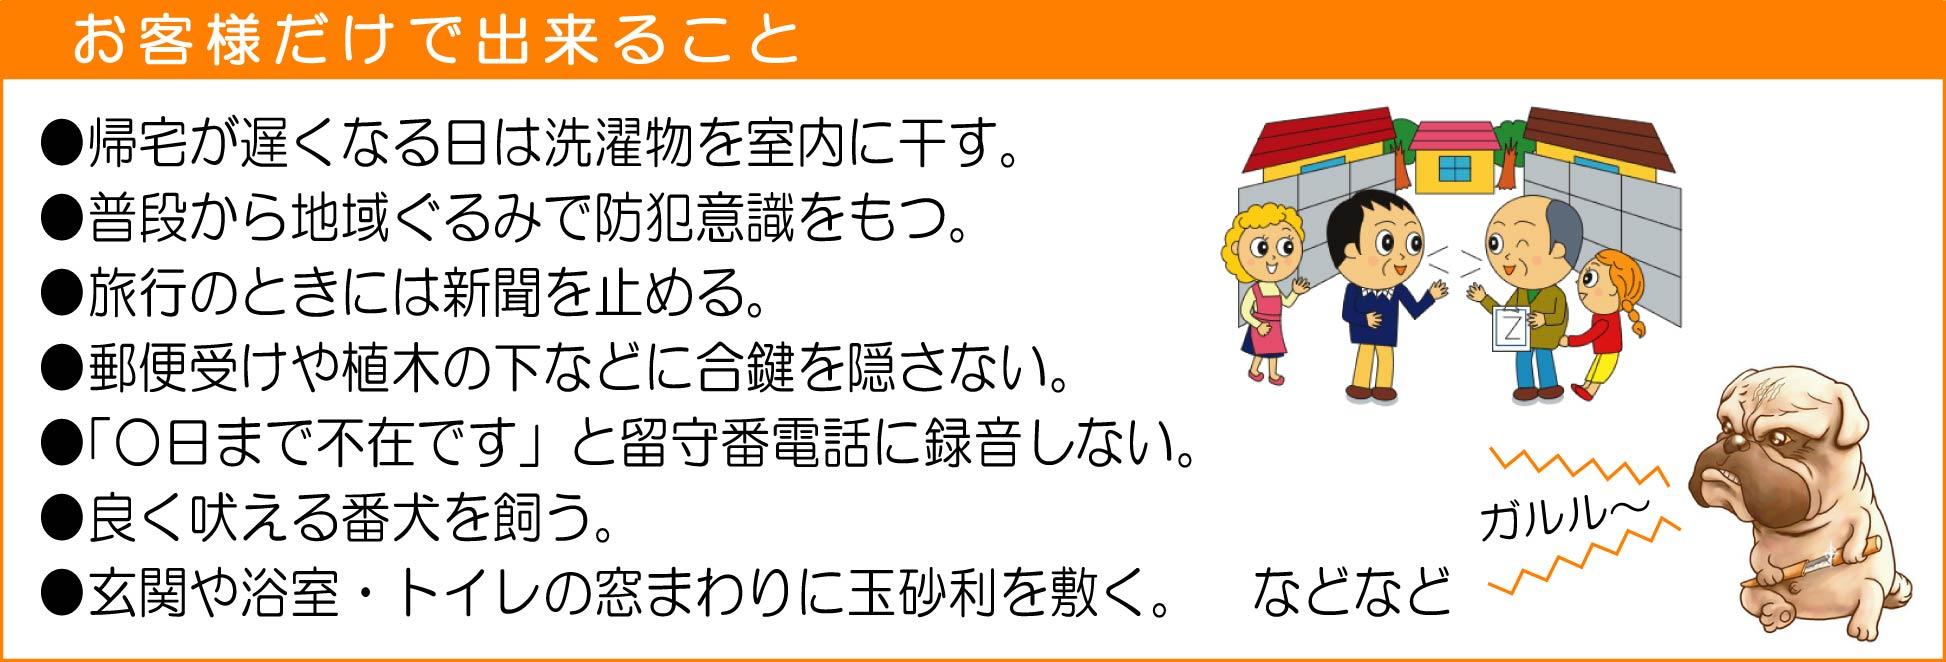 KuraSi-natu-sin72-13.jpg